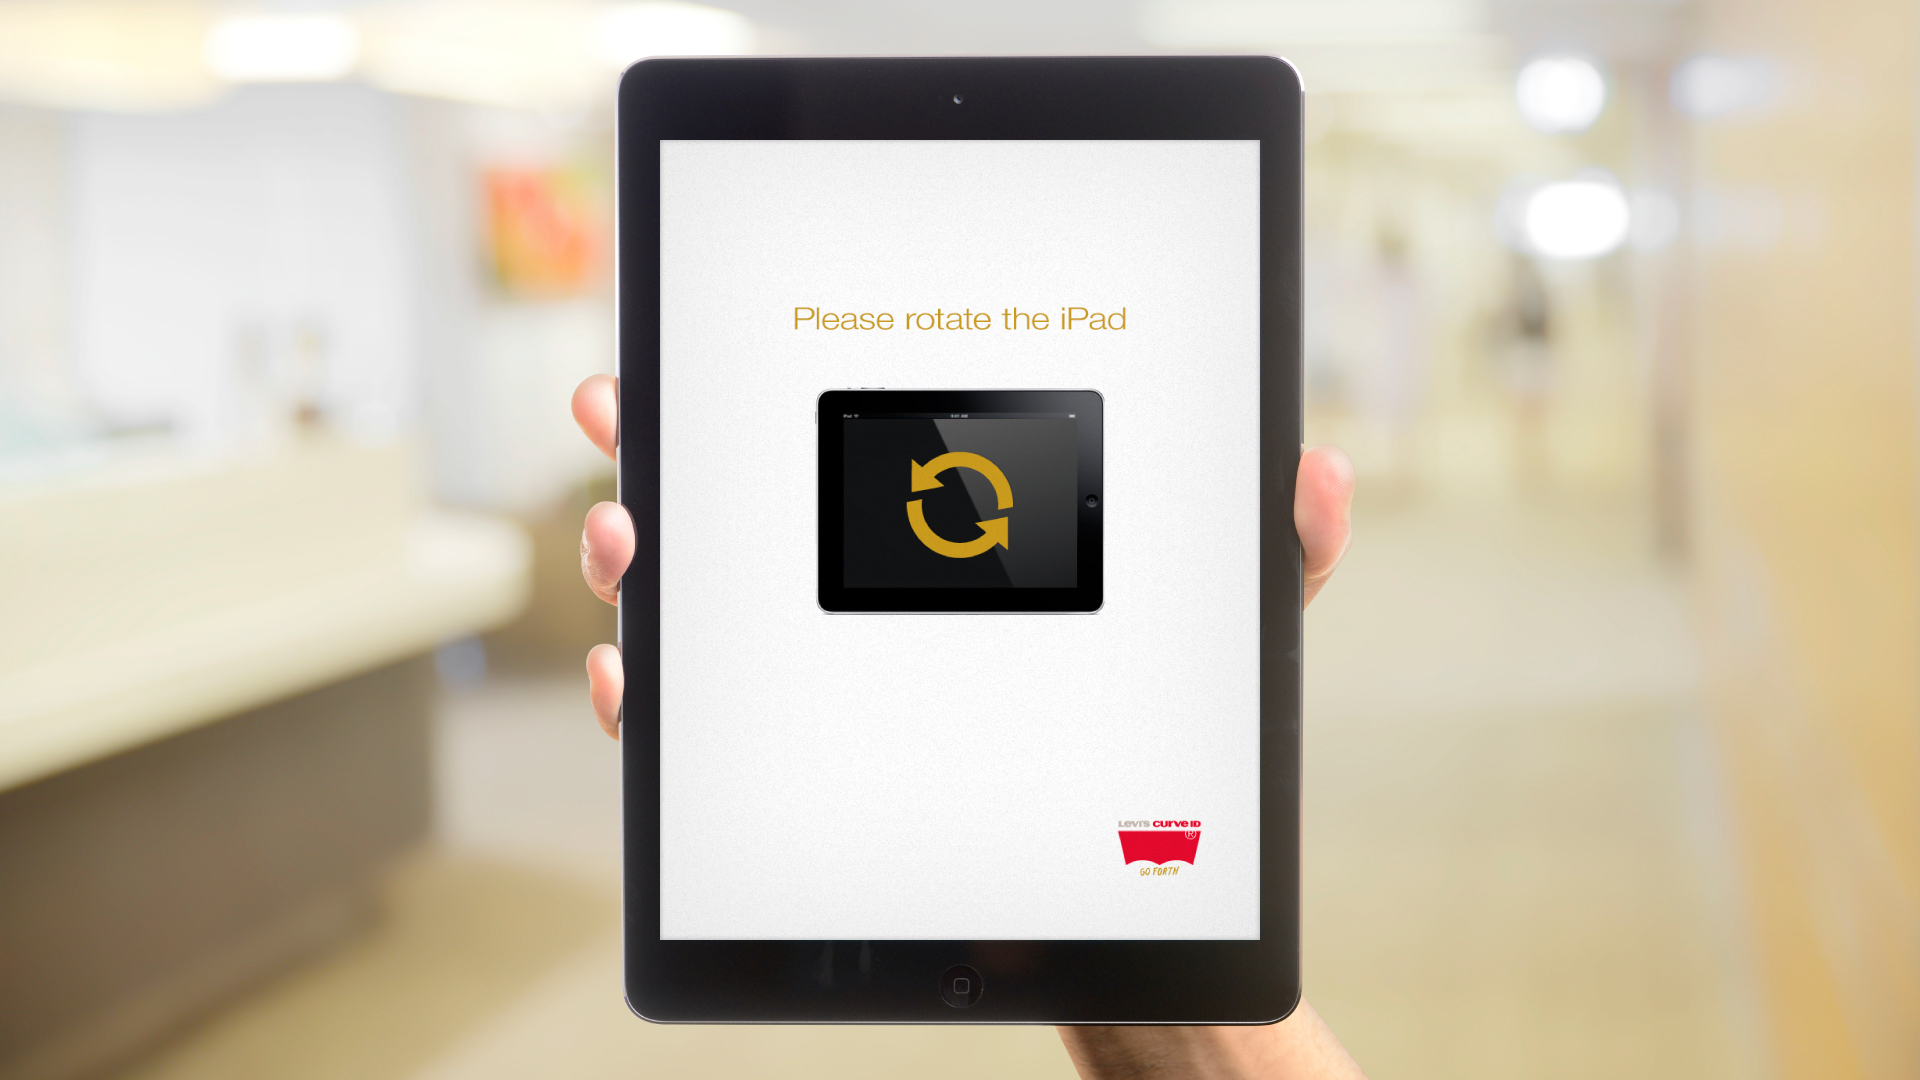 iPad Web App – Rotate Orientation